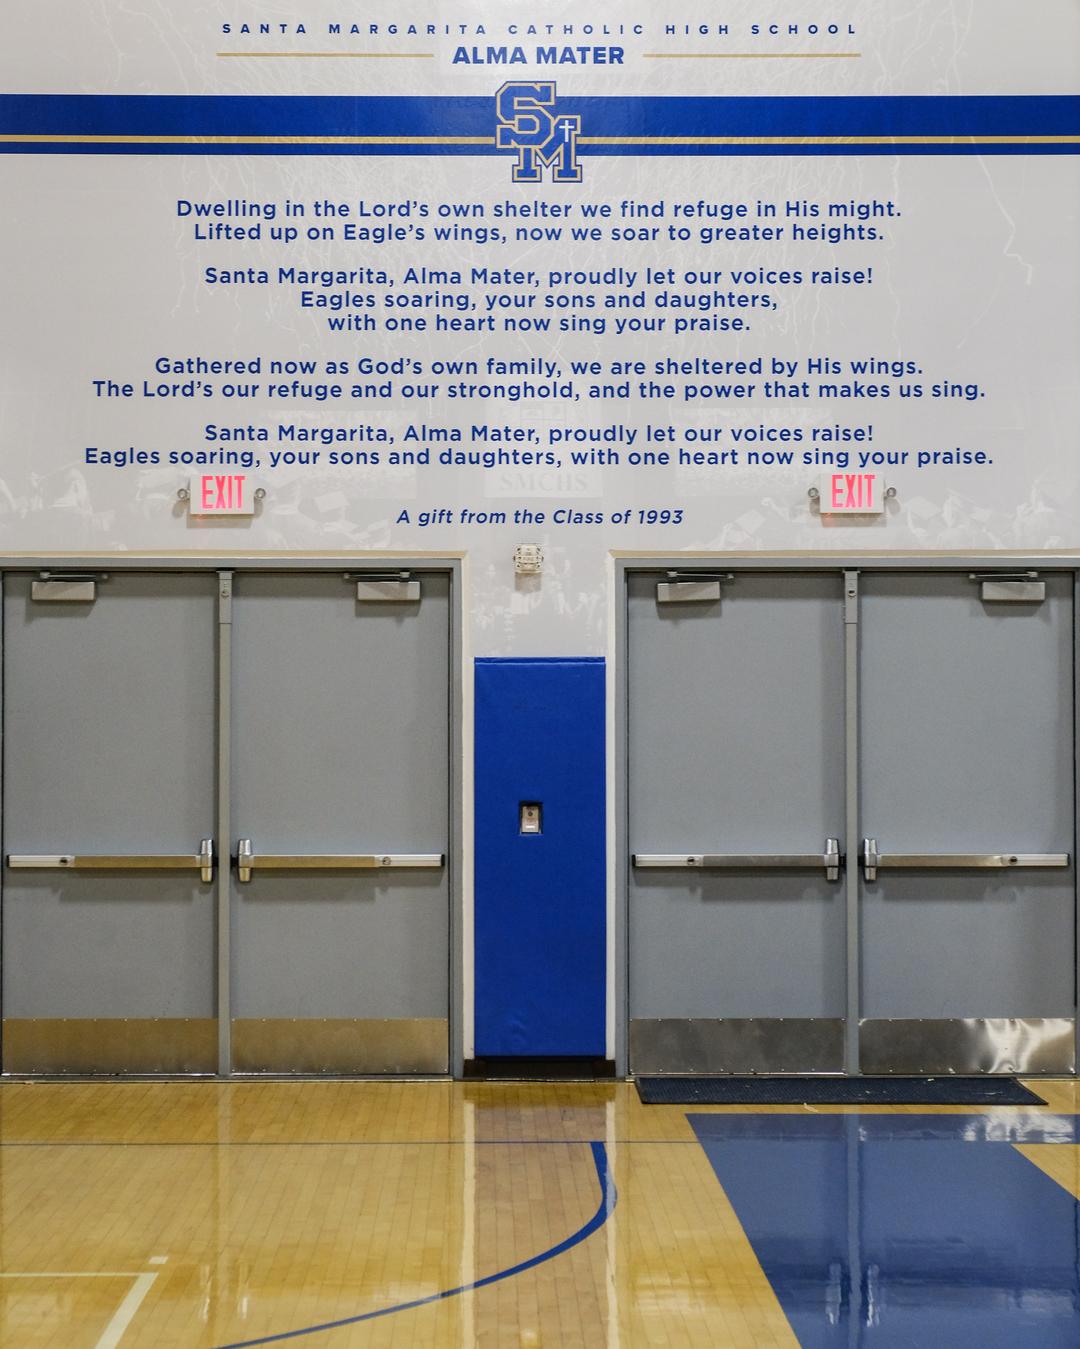 Facilities - Santa Margarita Catholic High School